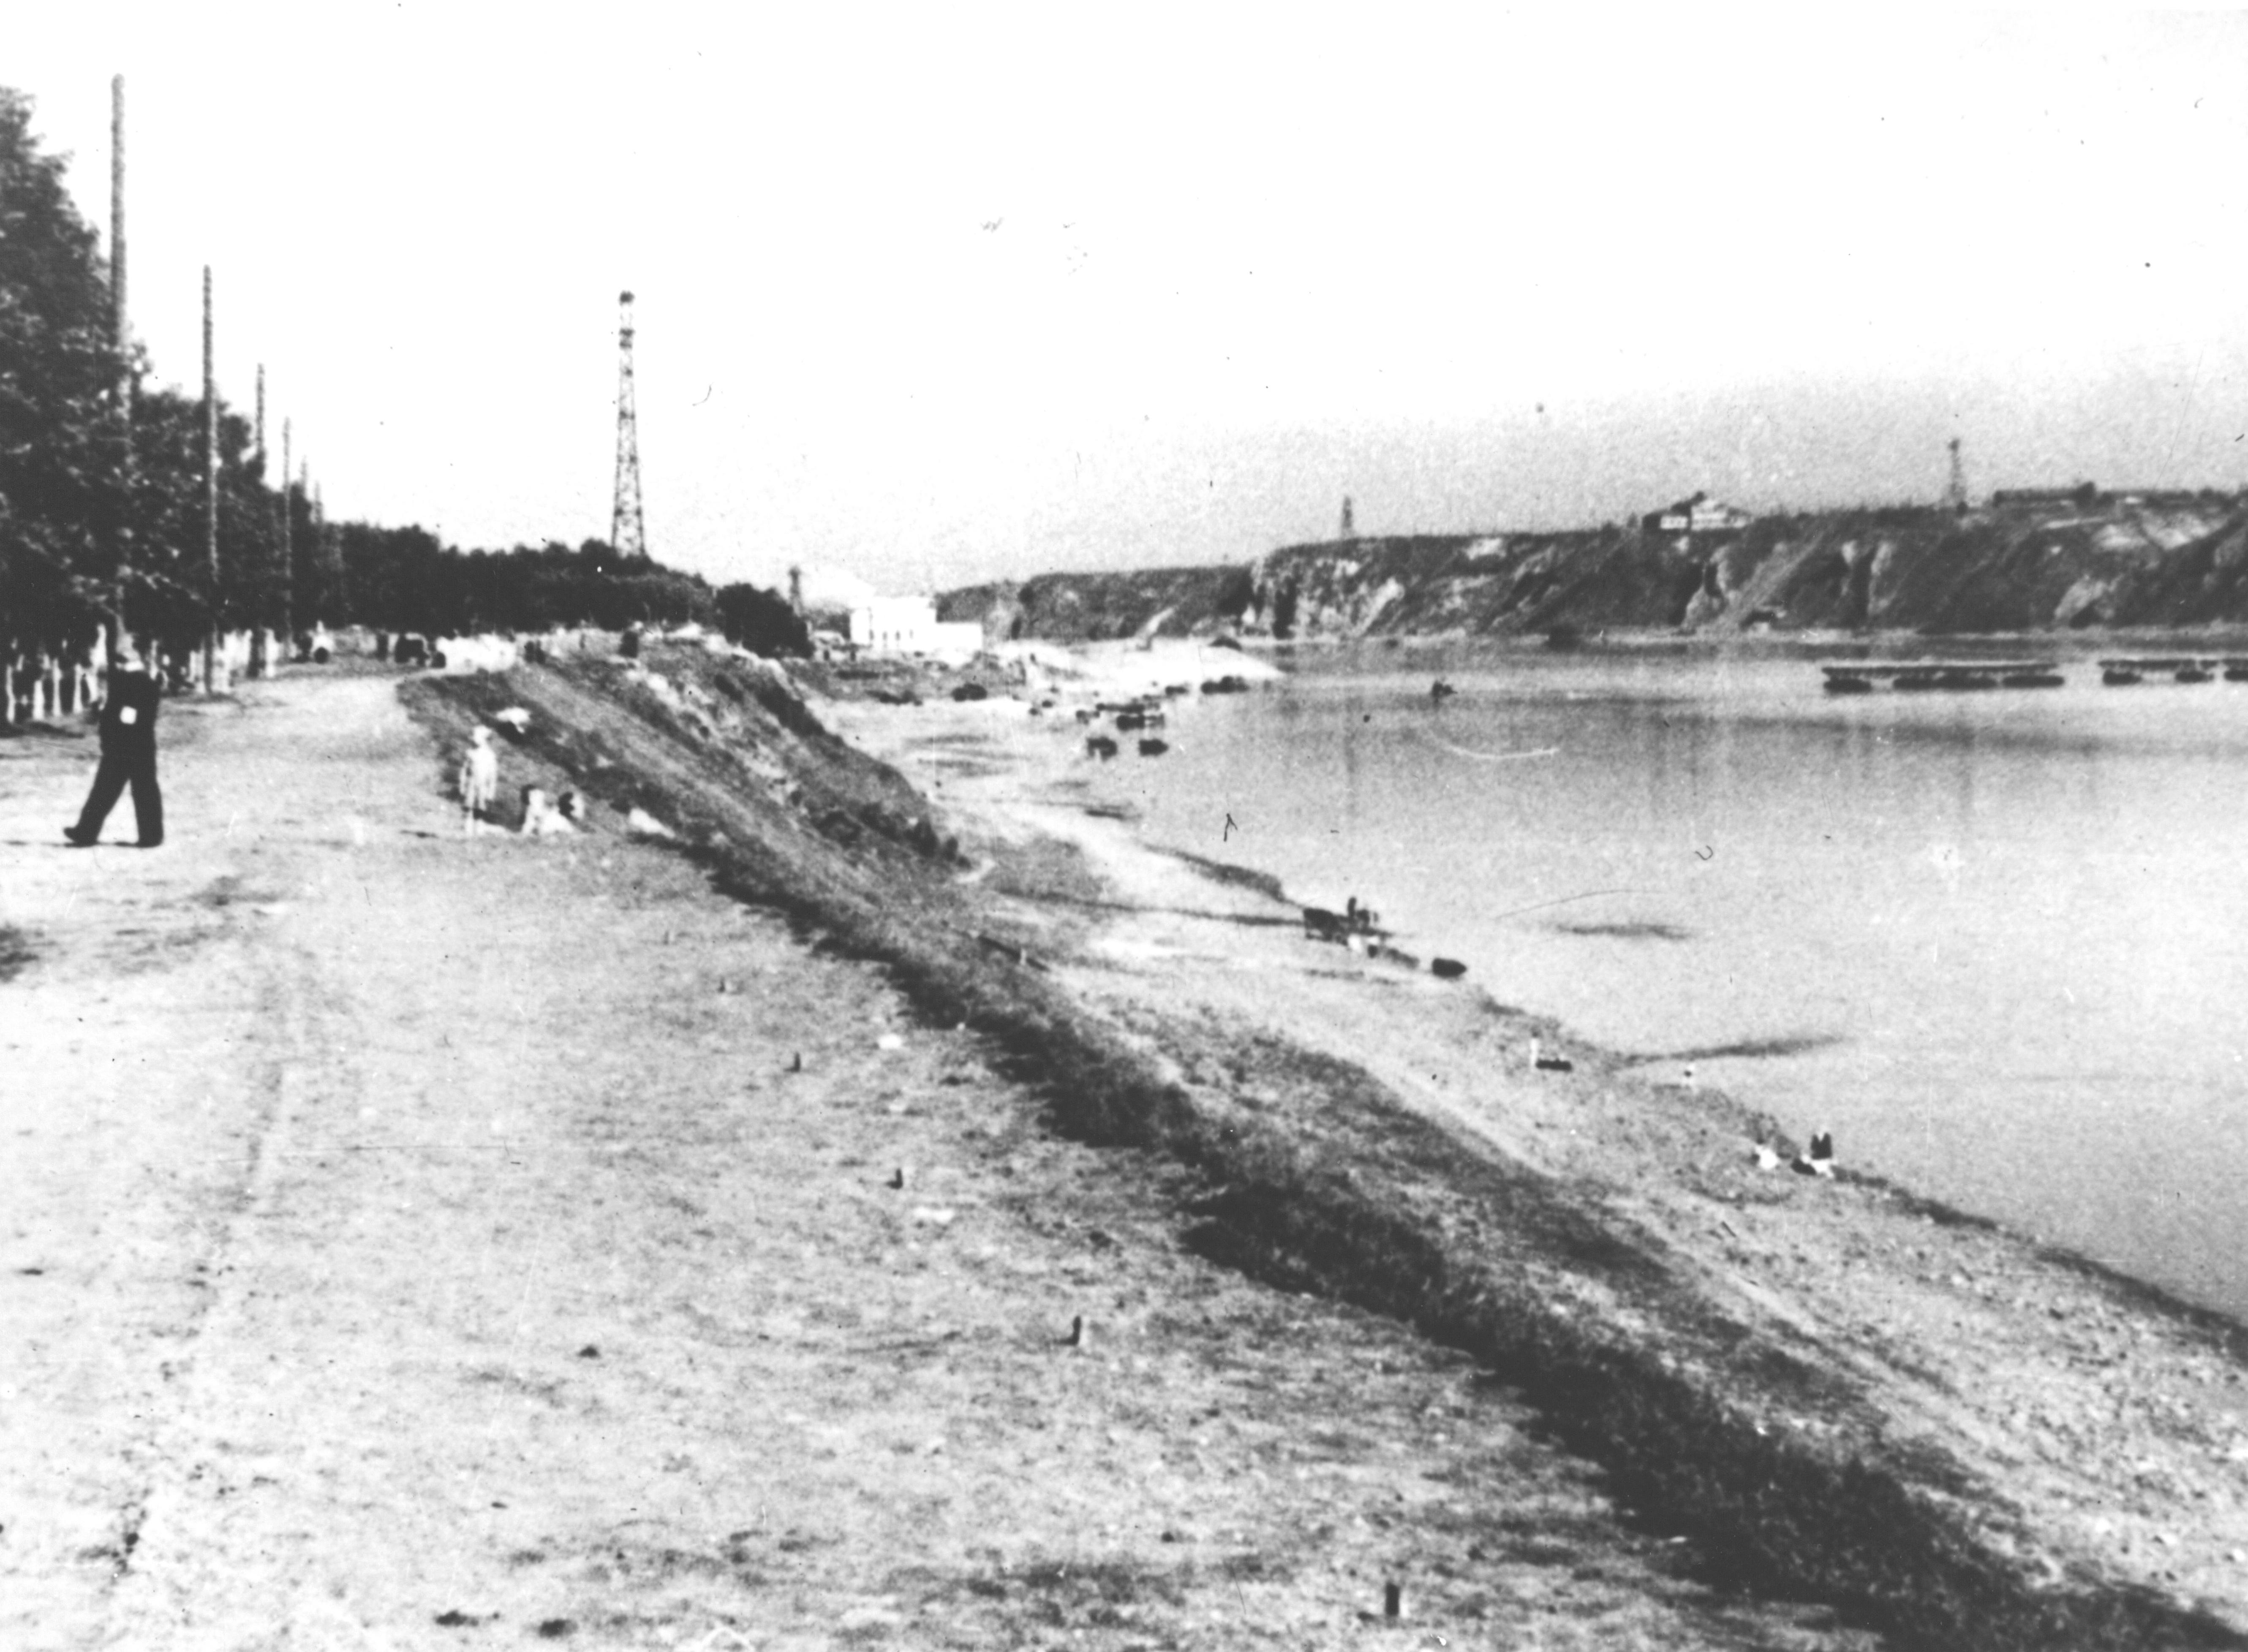 gku-ko-gako_fotofond_op_10_d_108_l_1_pritomskaja-naberezhnaja-g_kemerovo_1930-1940.jpg